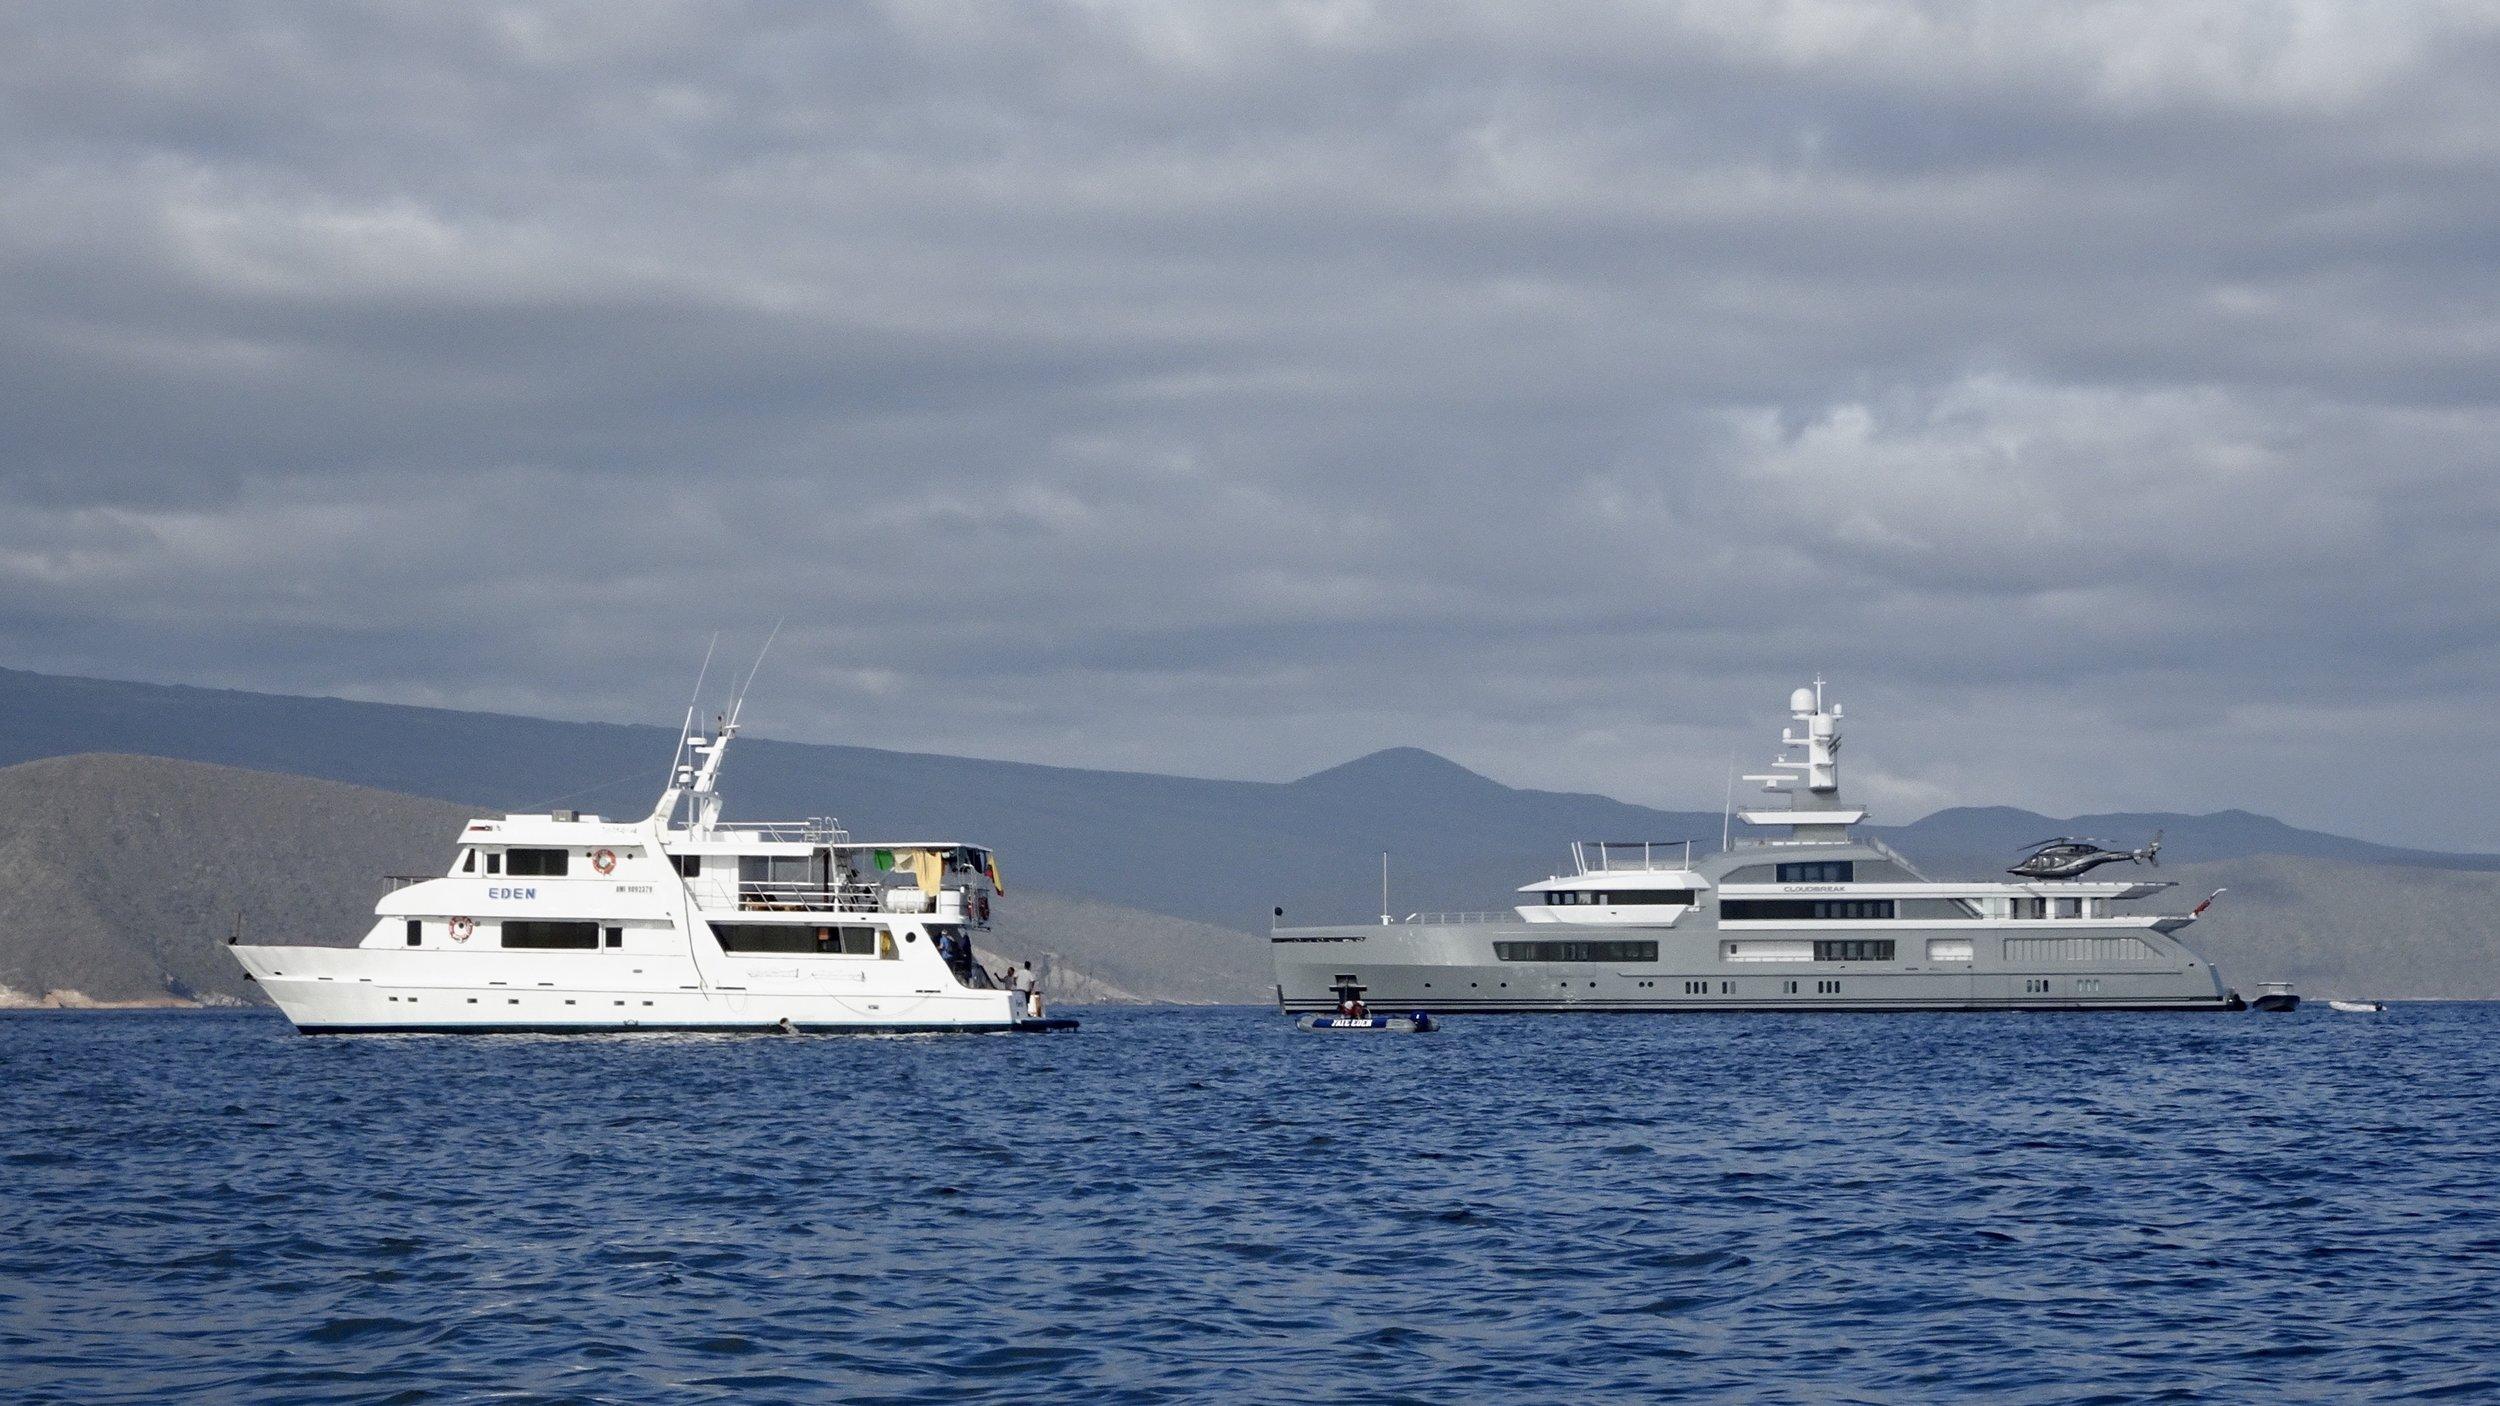 Eden and Cloudbreak, Galapagos Islands cruise boats, @acrosslandsea